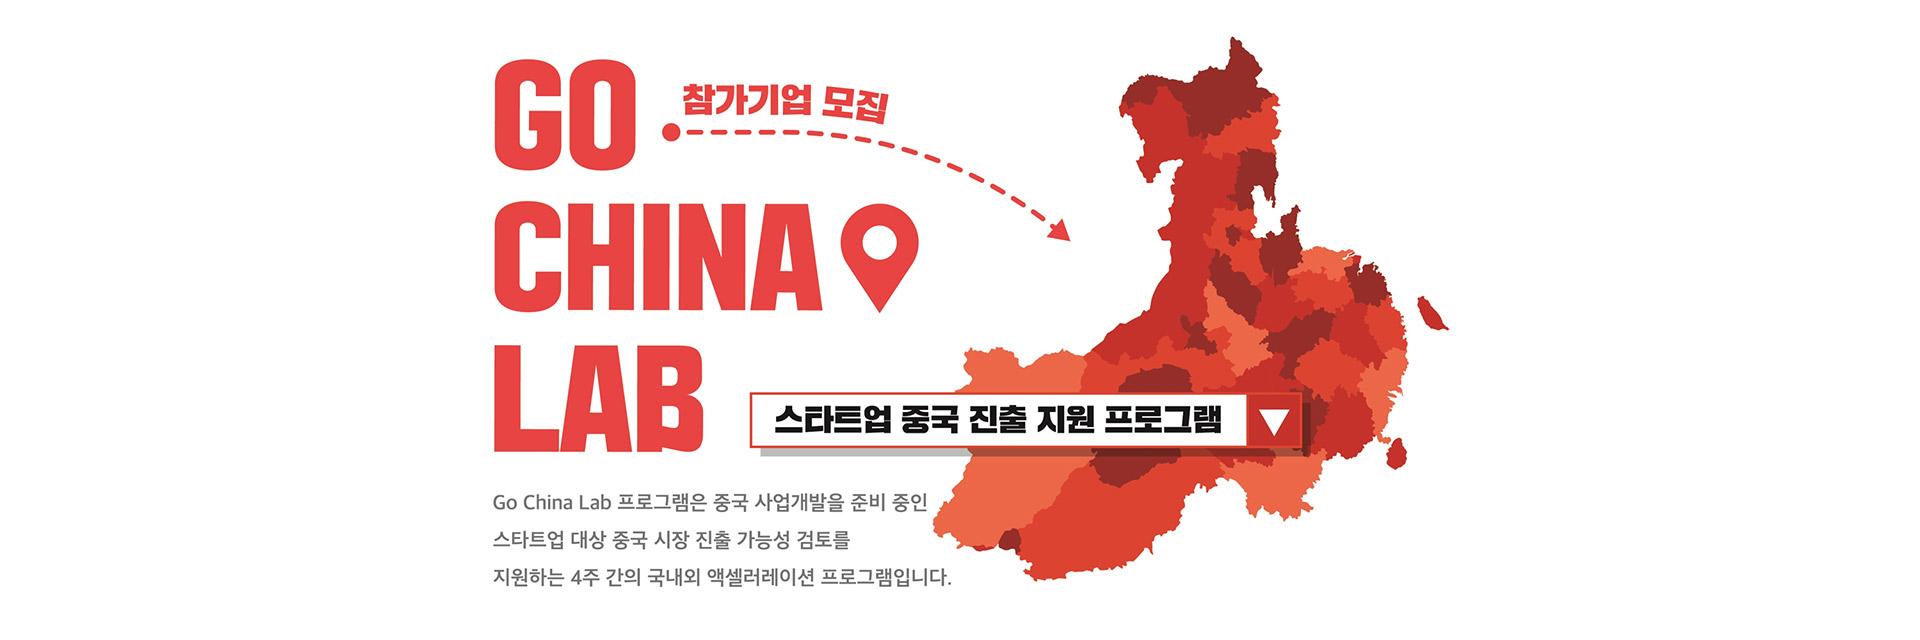 China Lab